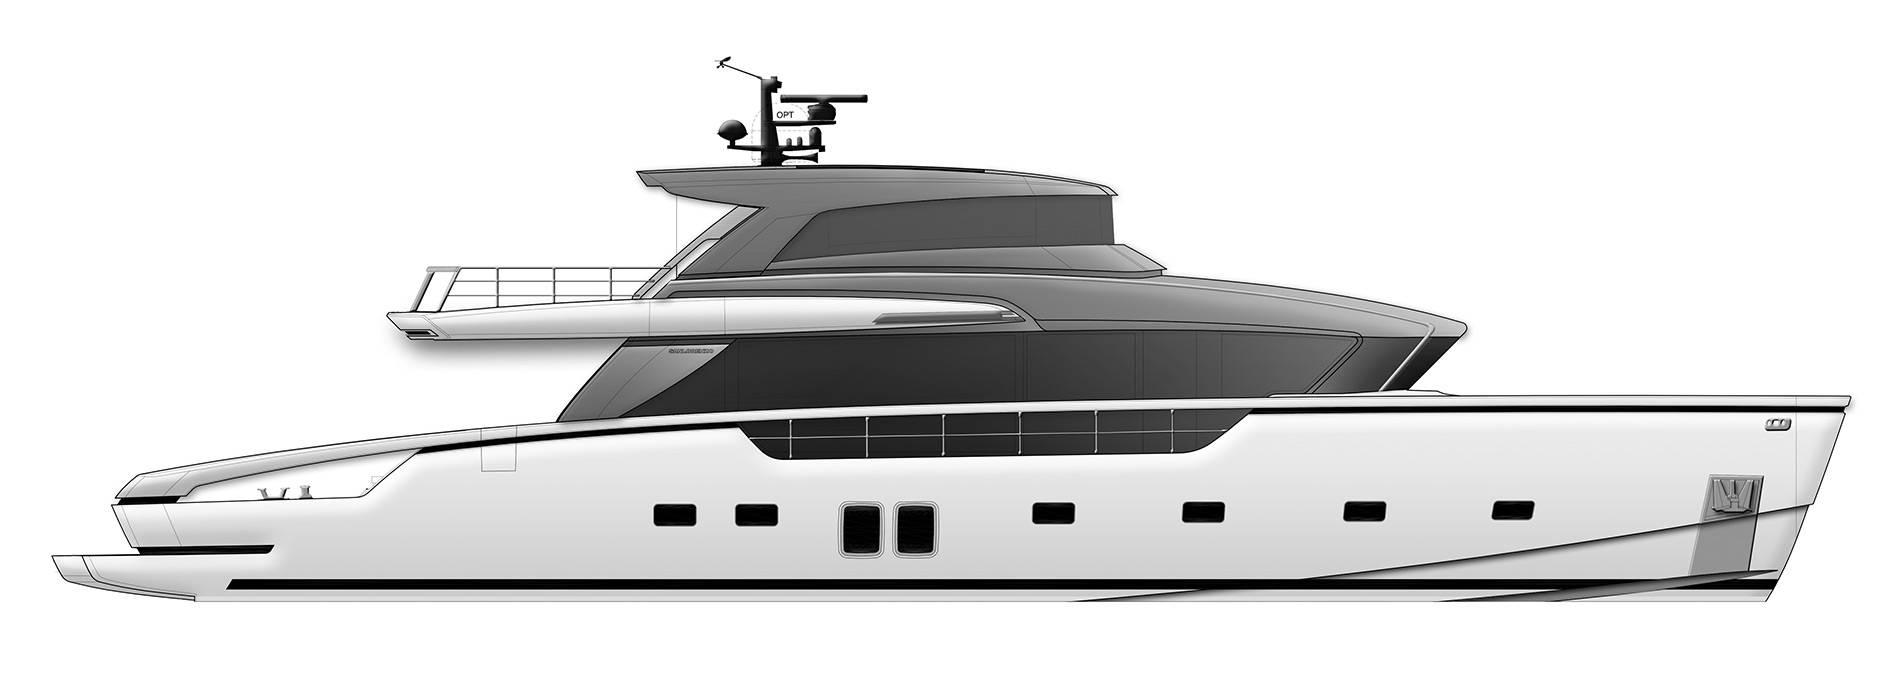 Sanlorenzo Yachts SX88 外观